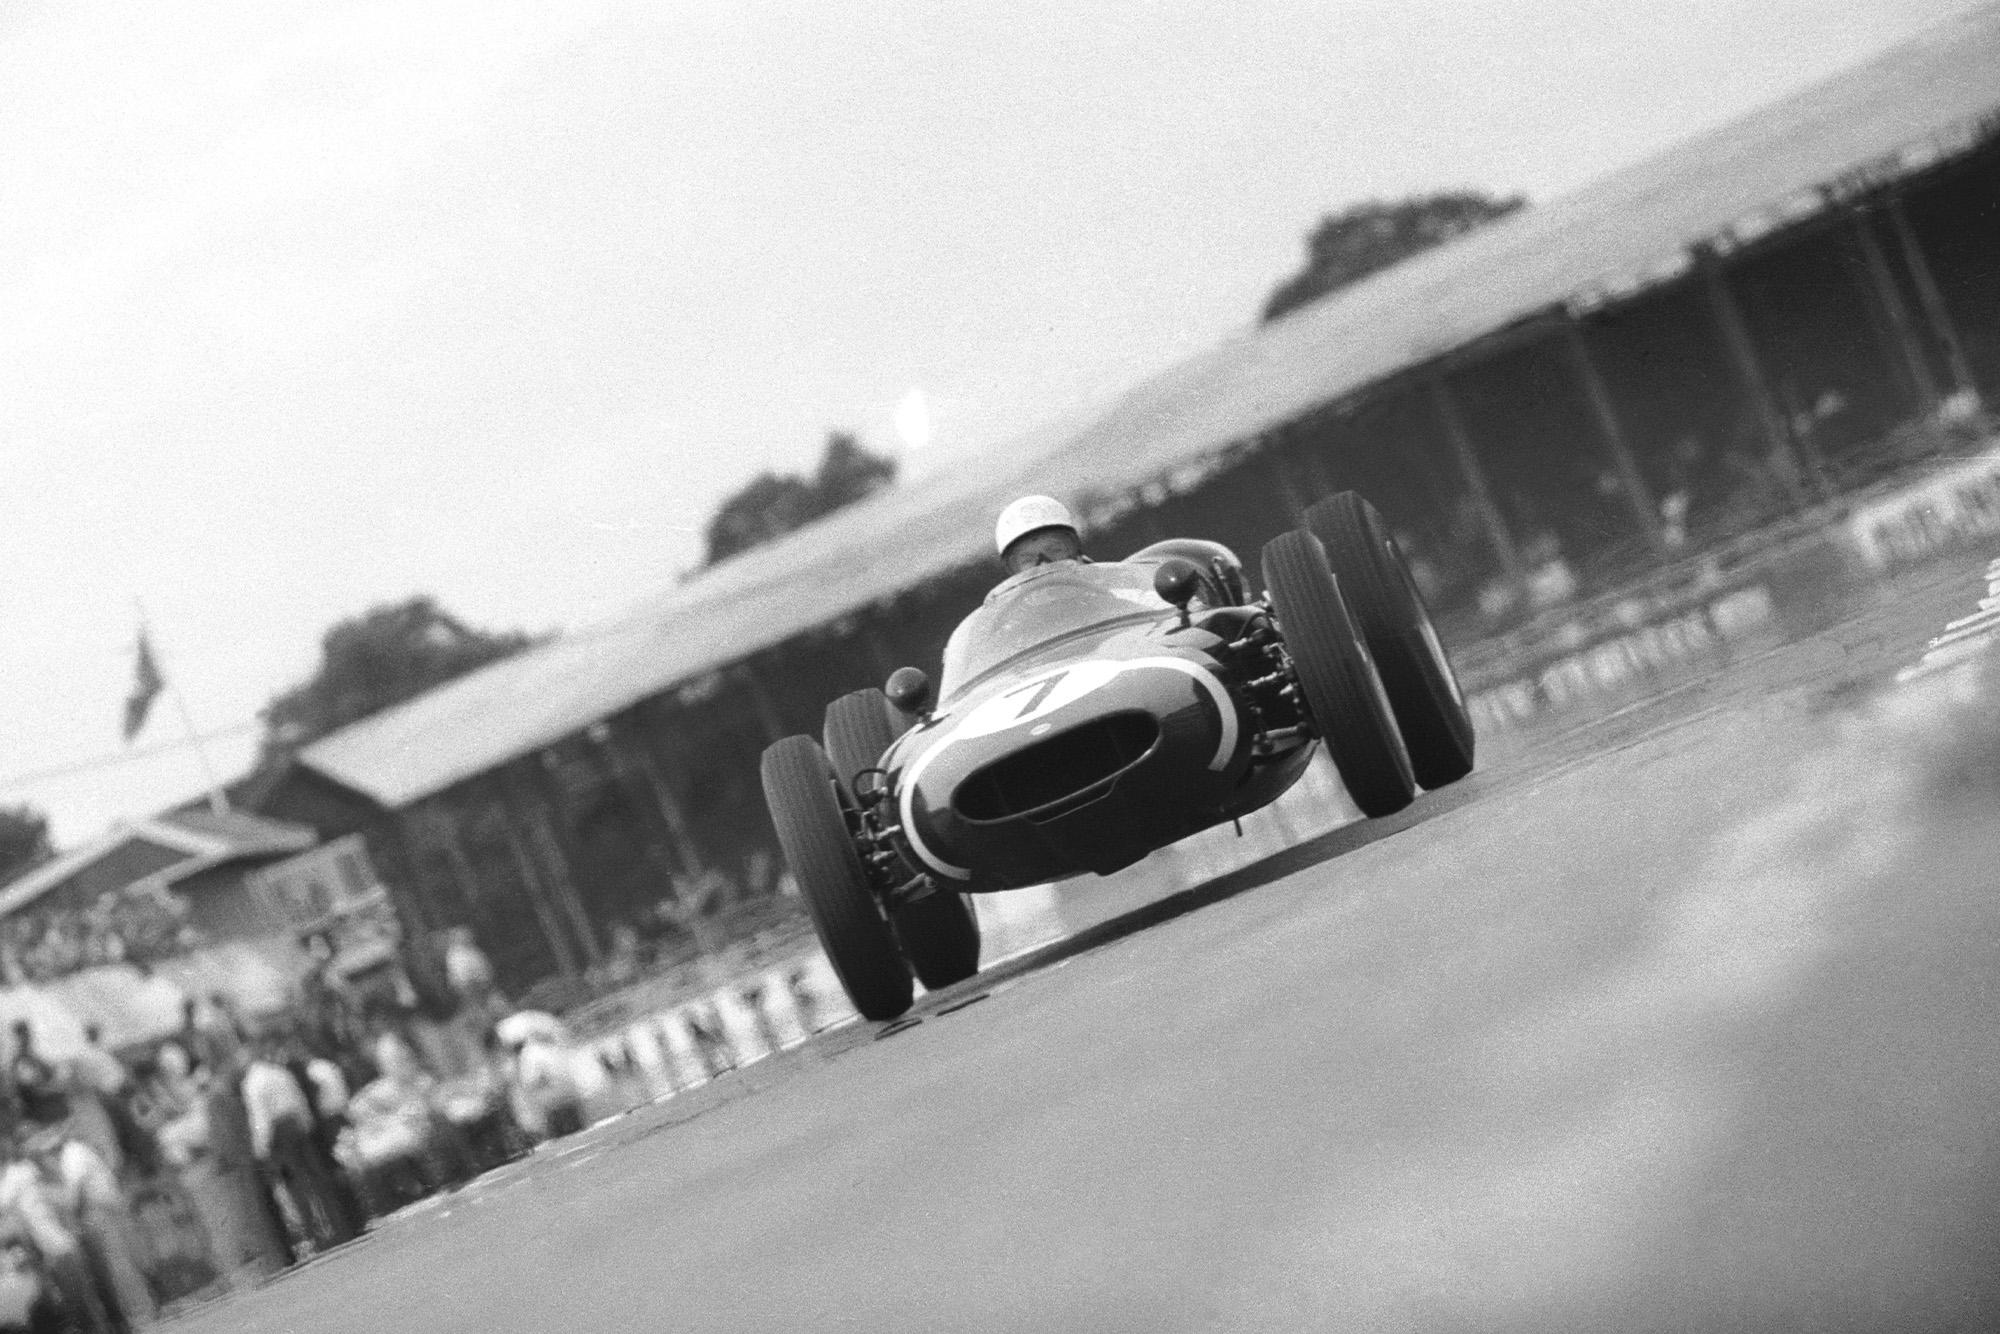 Stirling Moss in the 1961 British Grand Prix